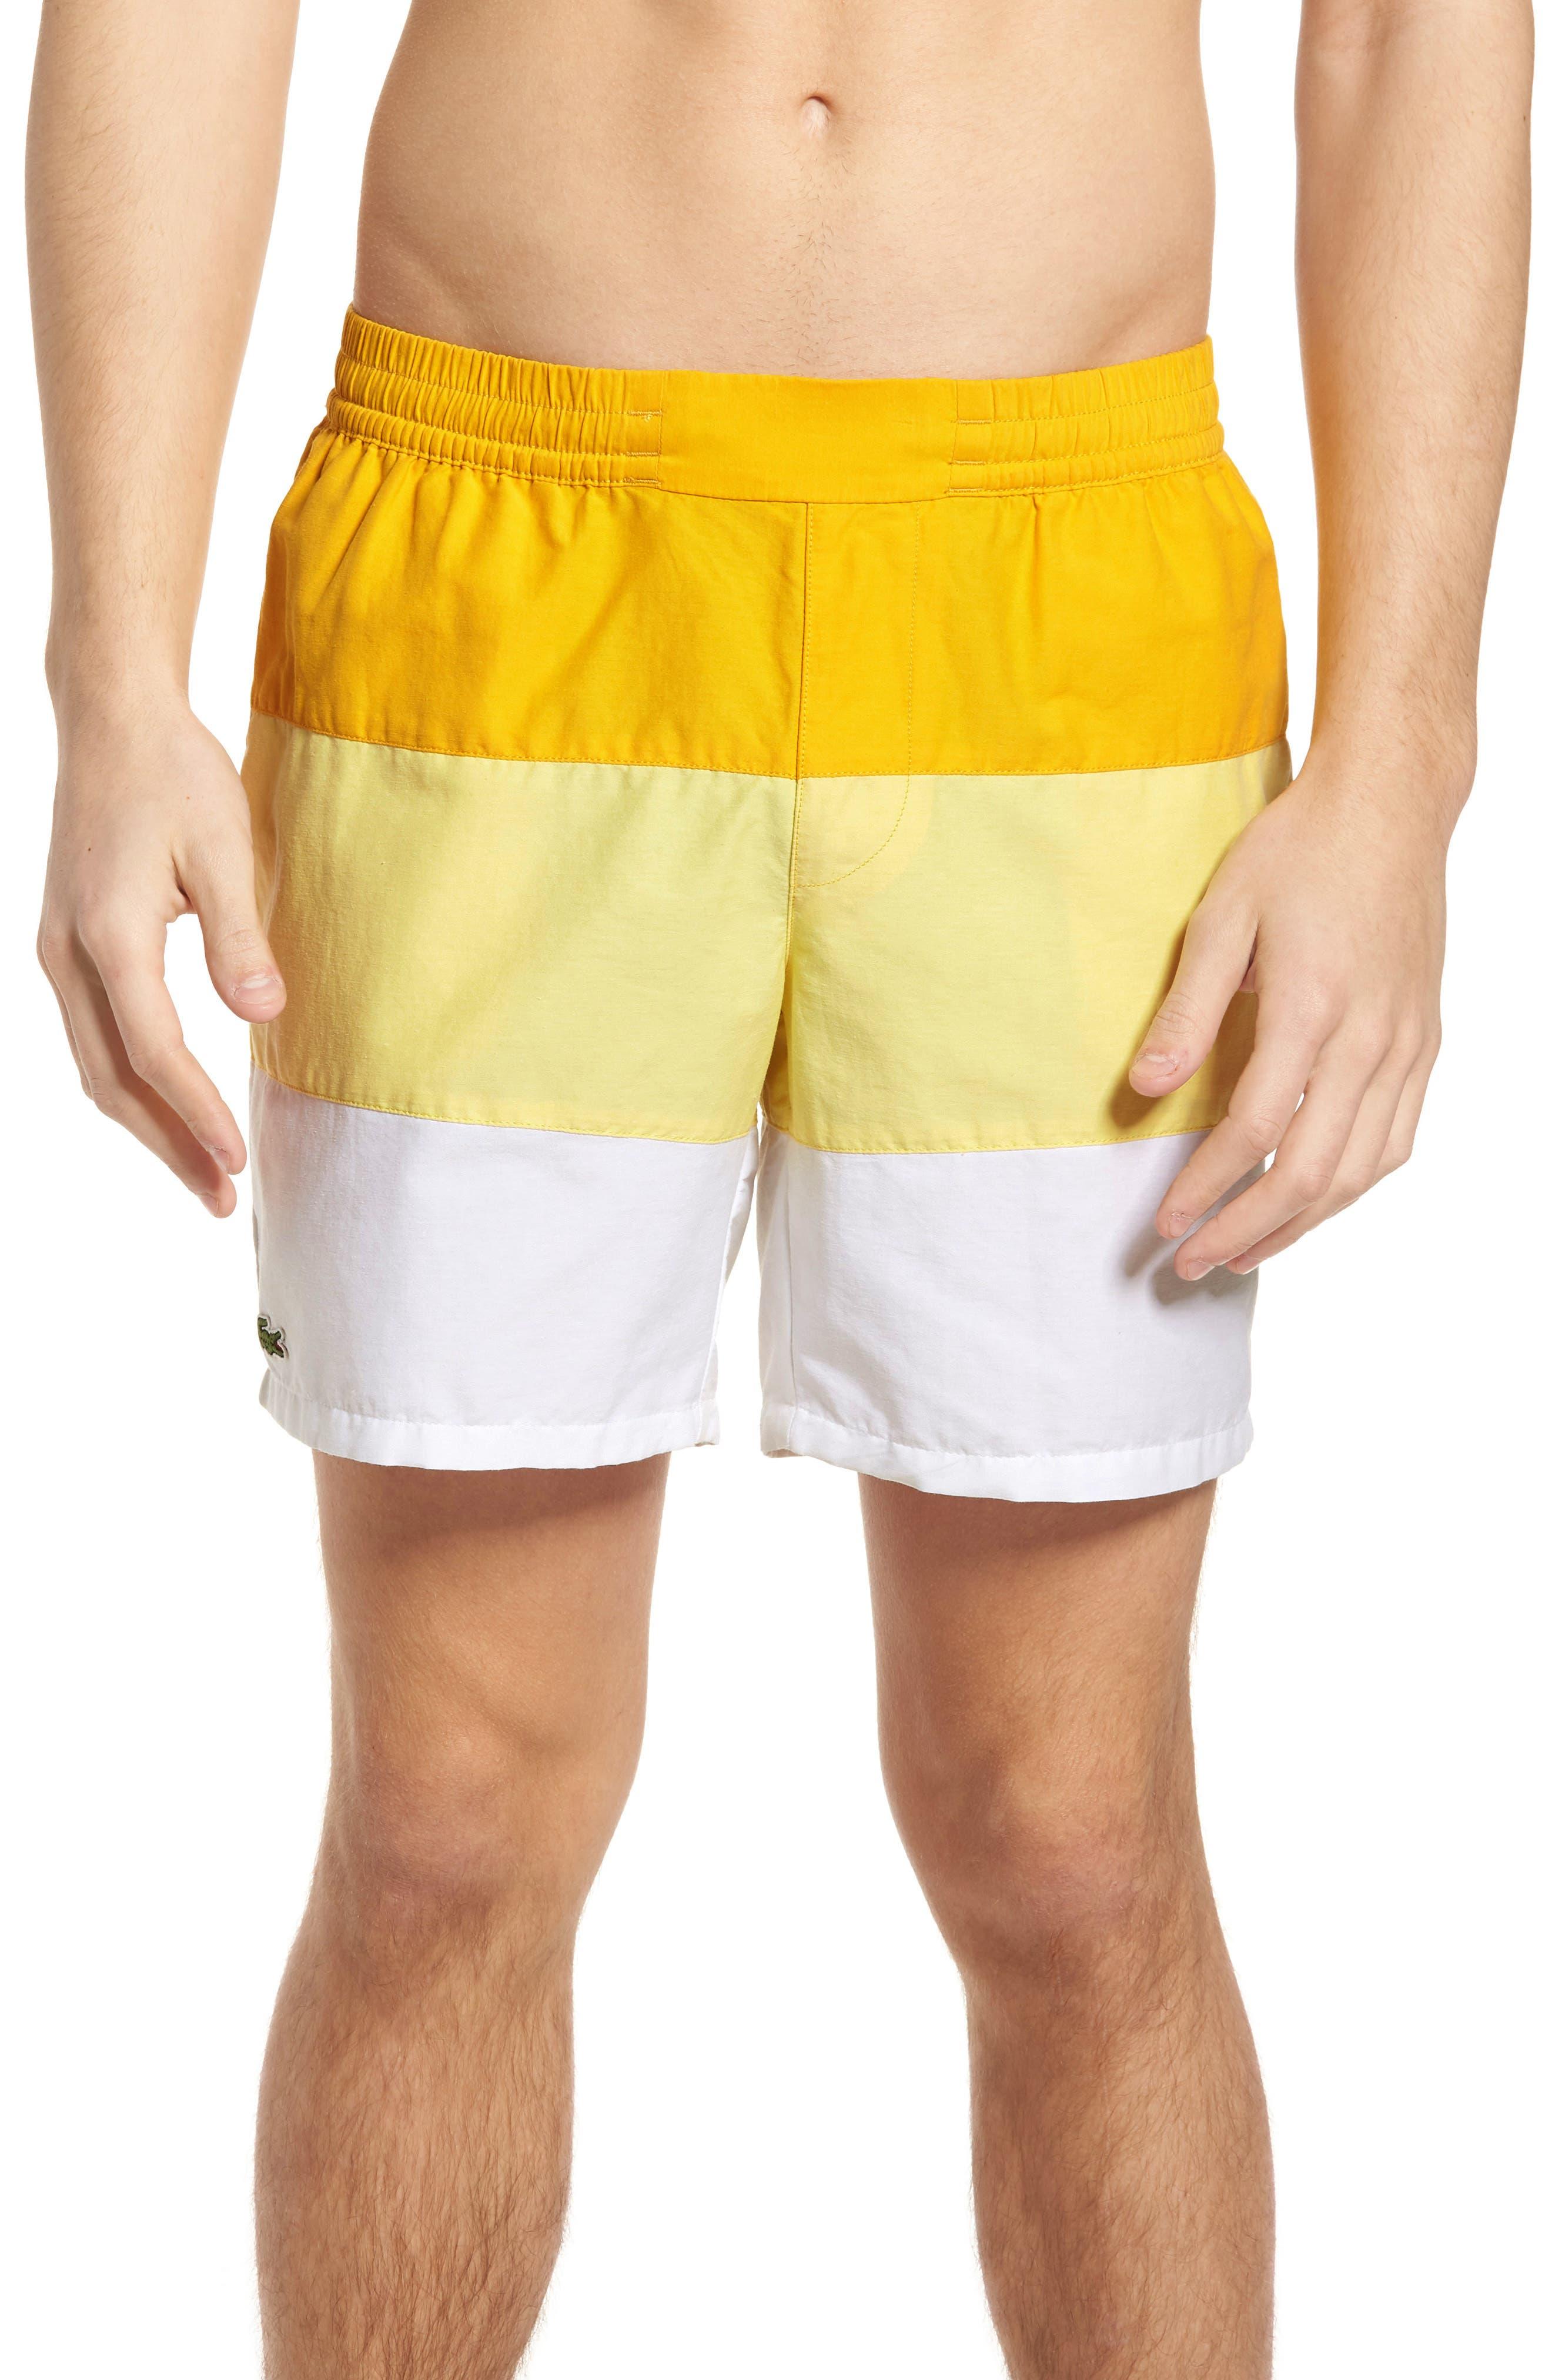 Colorblock Swim Trunks,                         Main,                         color, Solstice Yellow/ Yellow-White